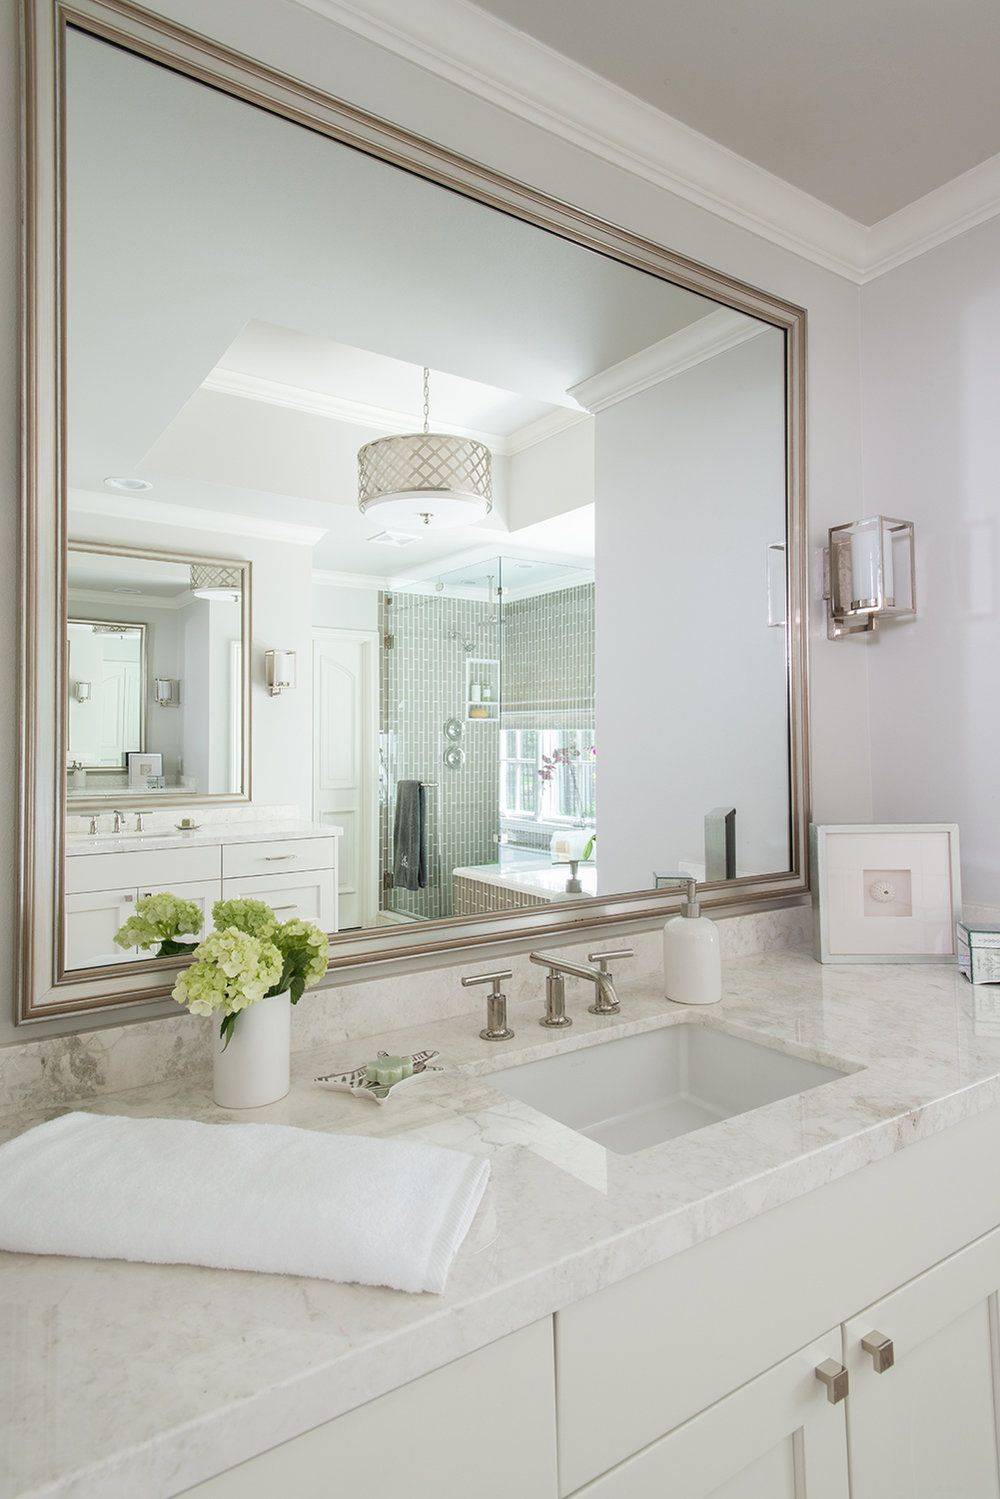 KA-8-Bath copy.jpg | House bathroom, White bathroom, Bath